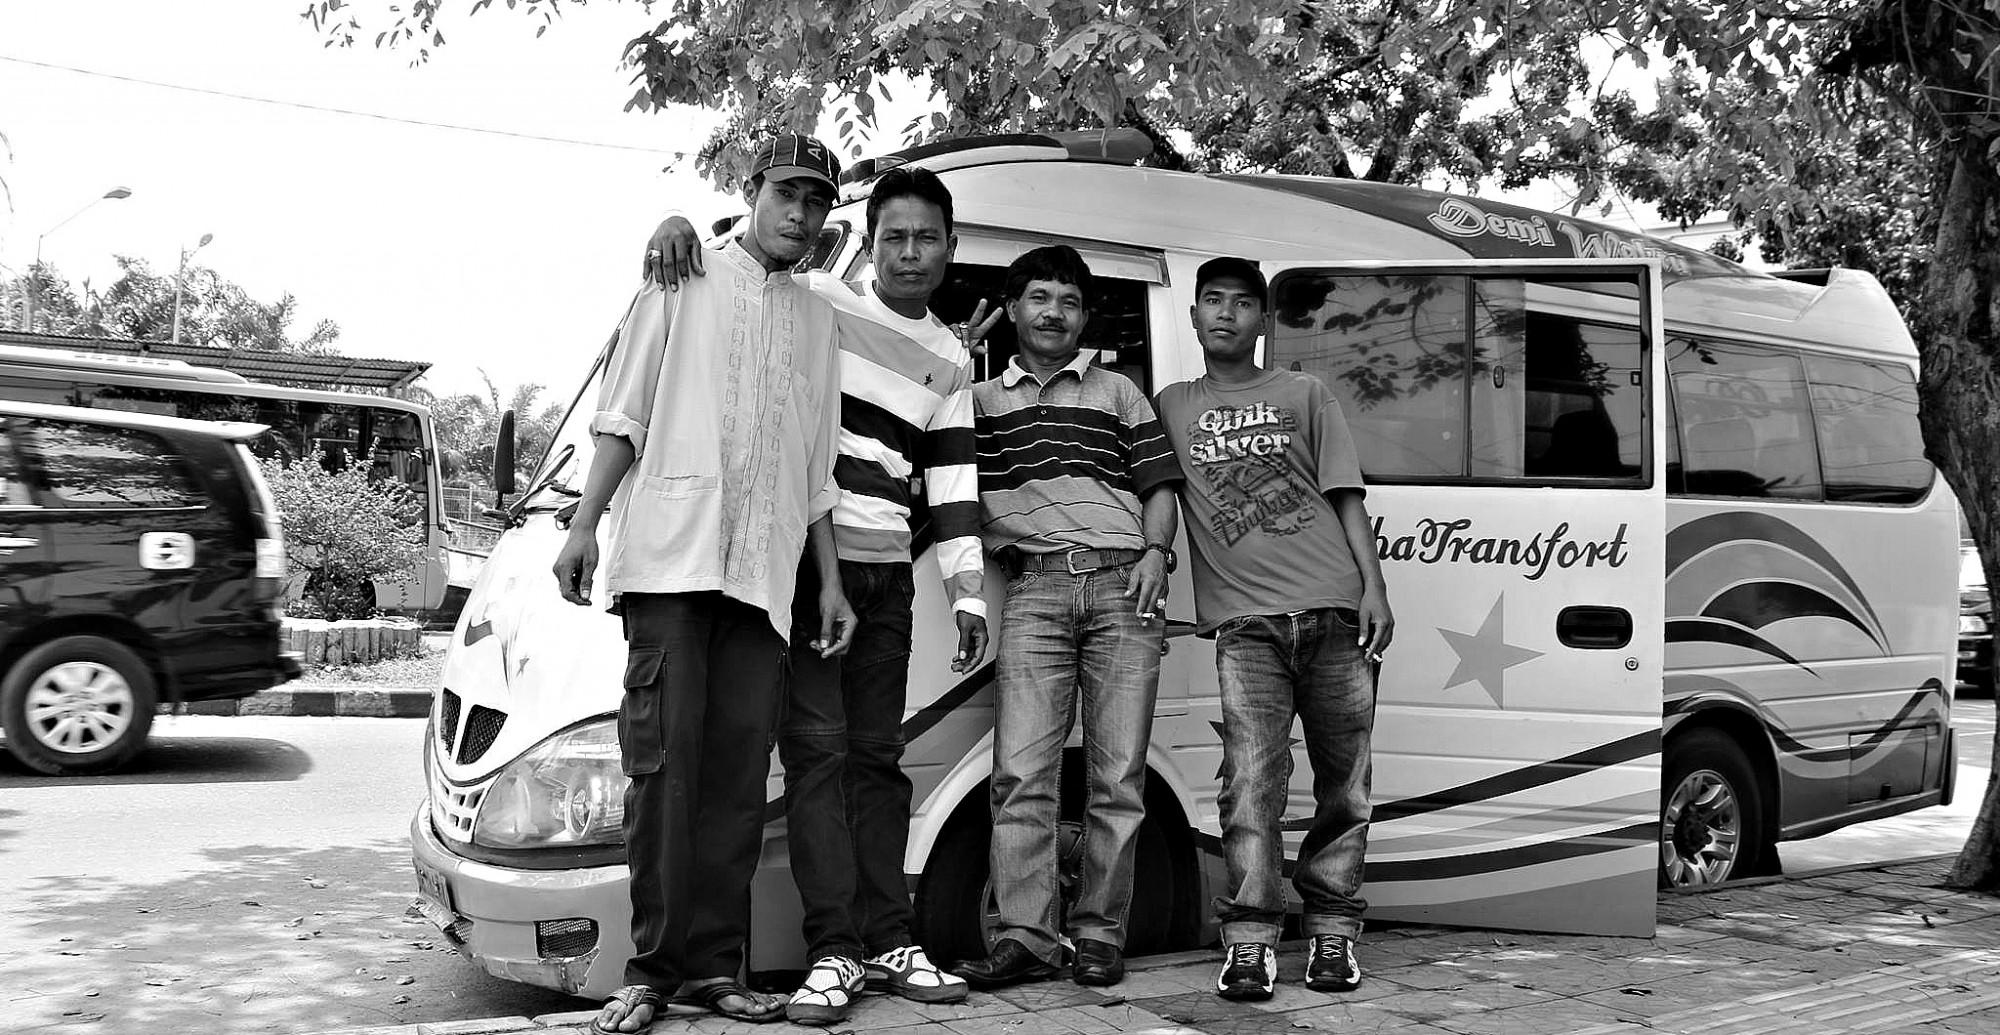 Ankords (mini van taxi) drivers in Padang. Photo by Ovidi Balaj